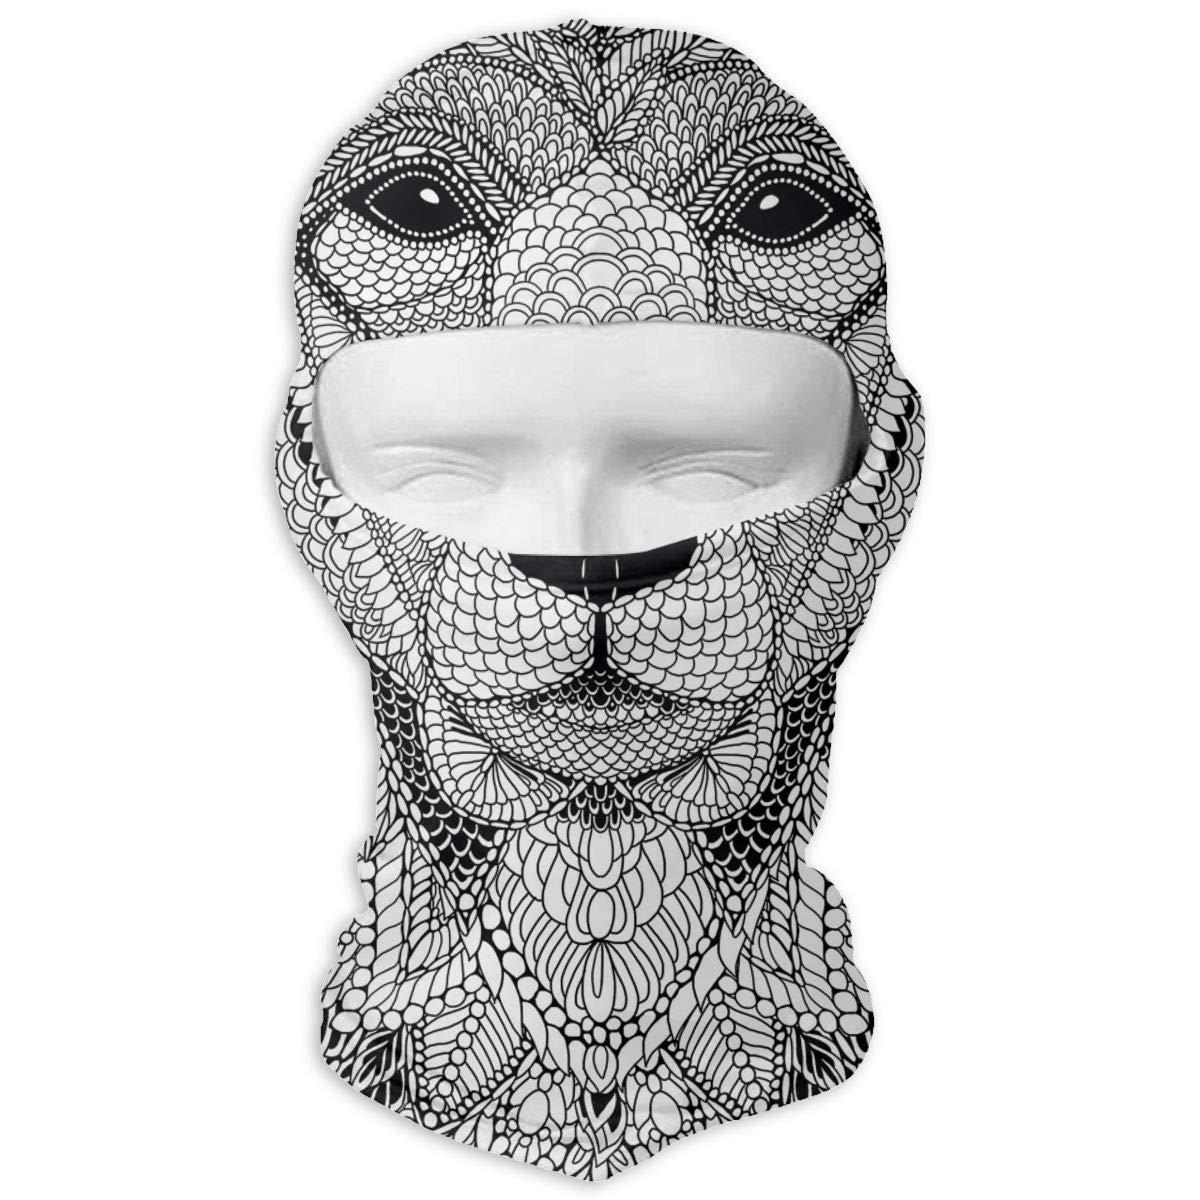 Wind-Resistant Face Mask LaoJi Bear Painting Winter Ski Mask Balaclava Hood